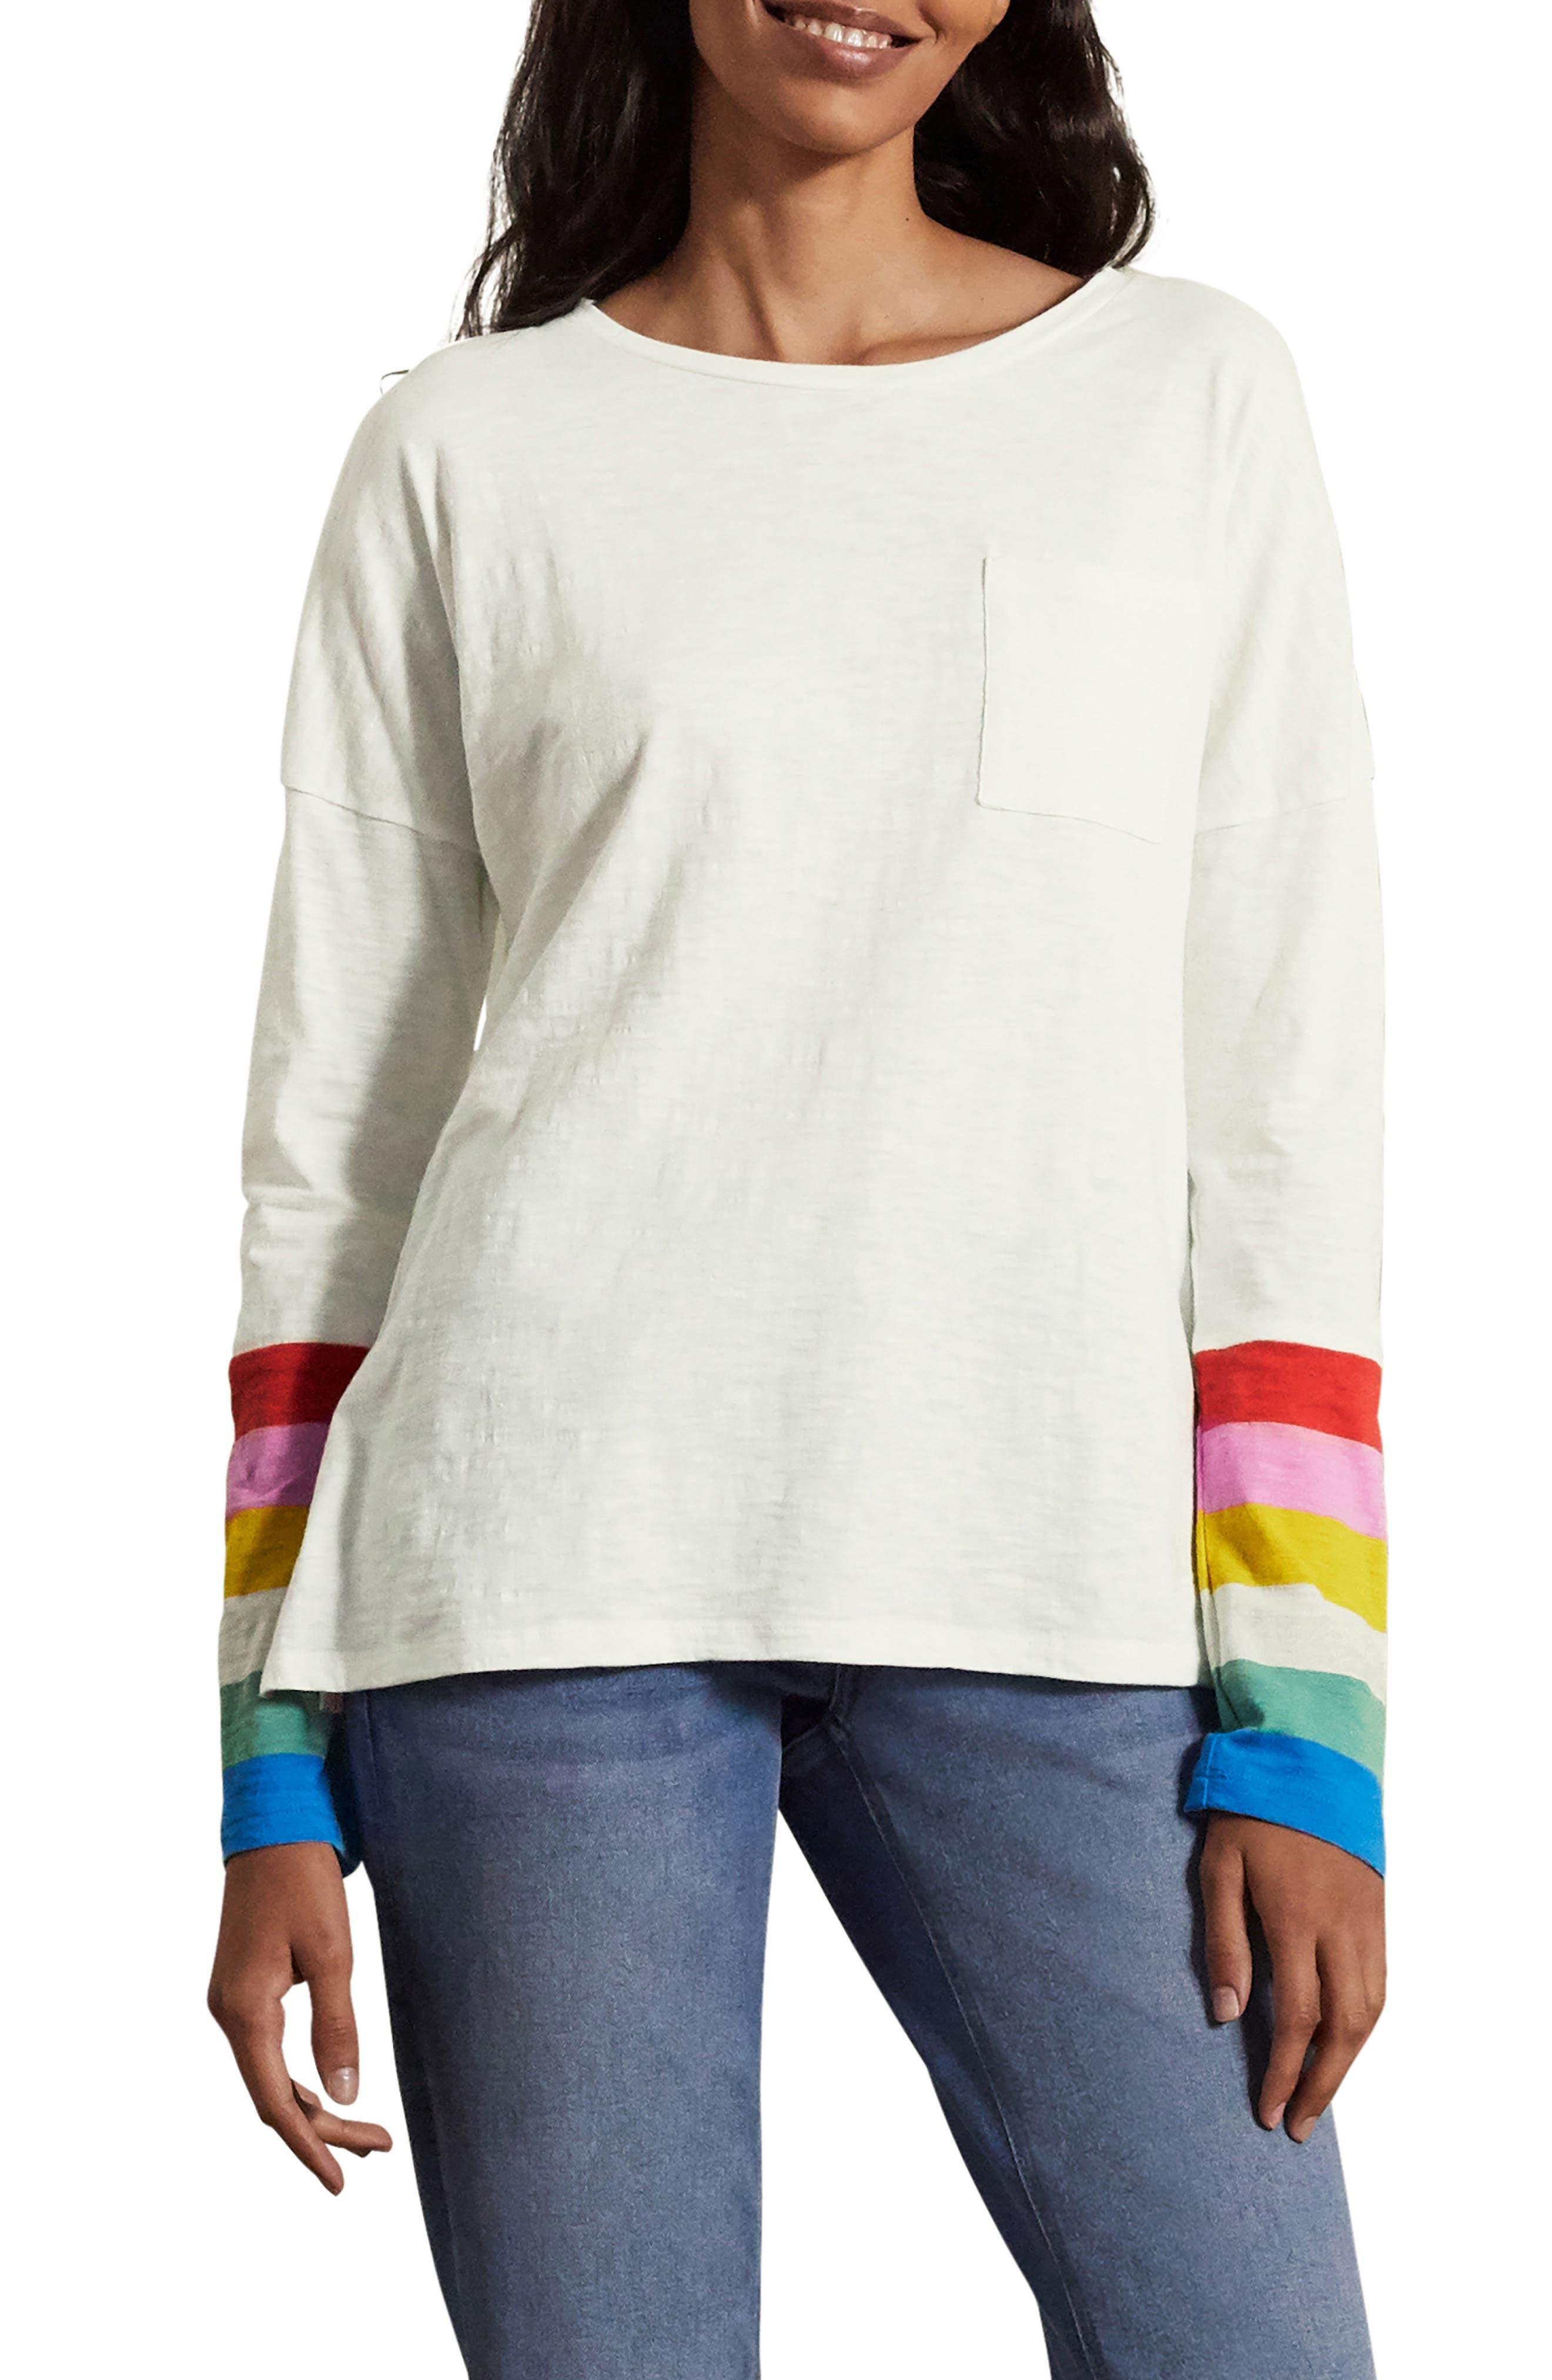 Boden Boxy Jersey Stripe Cotton Top